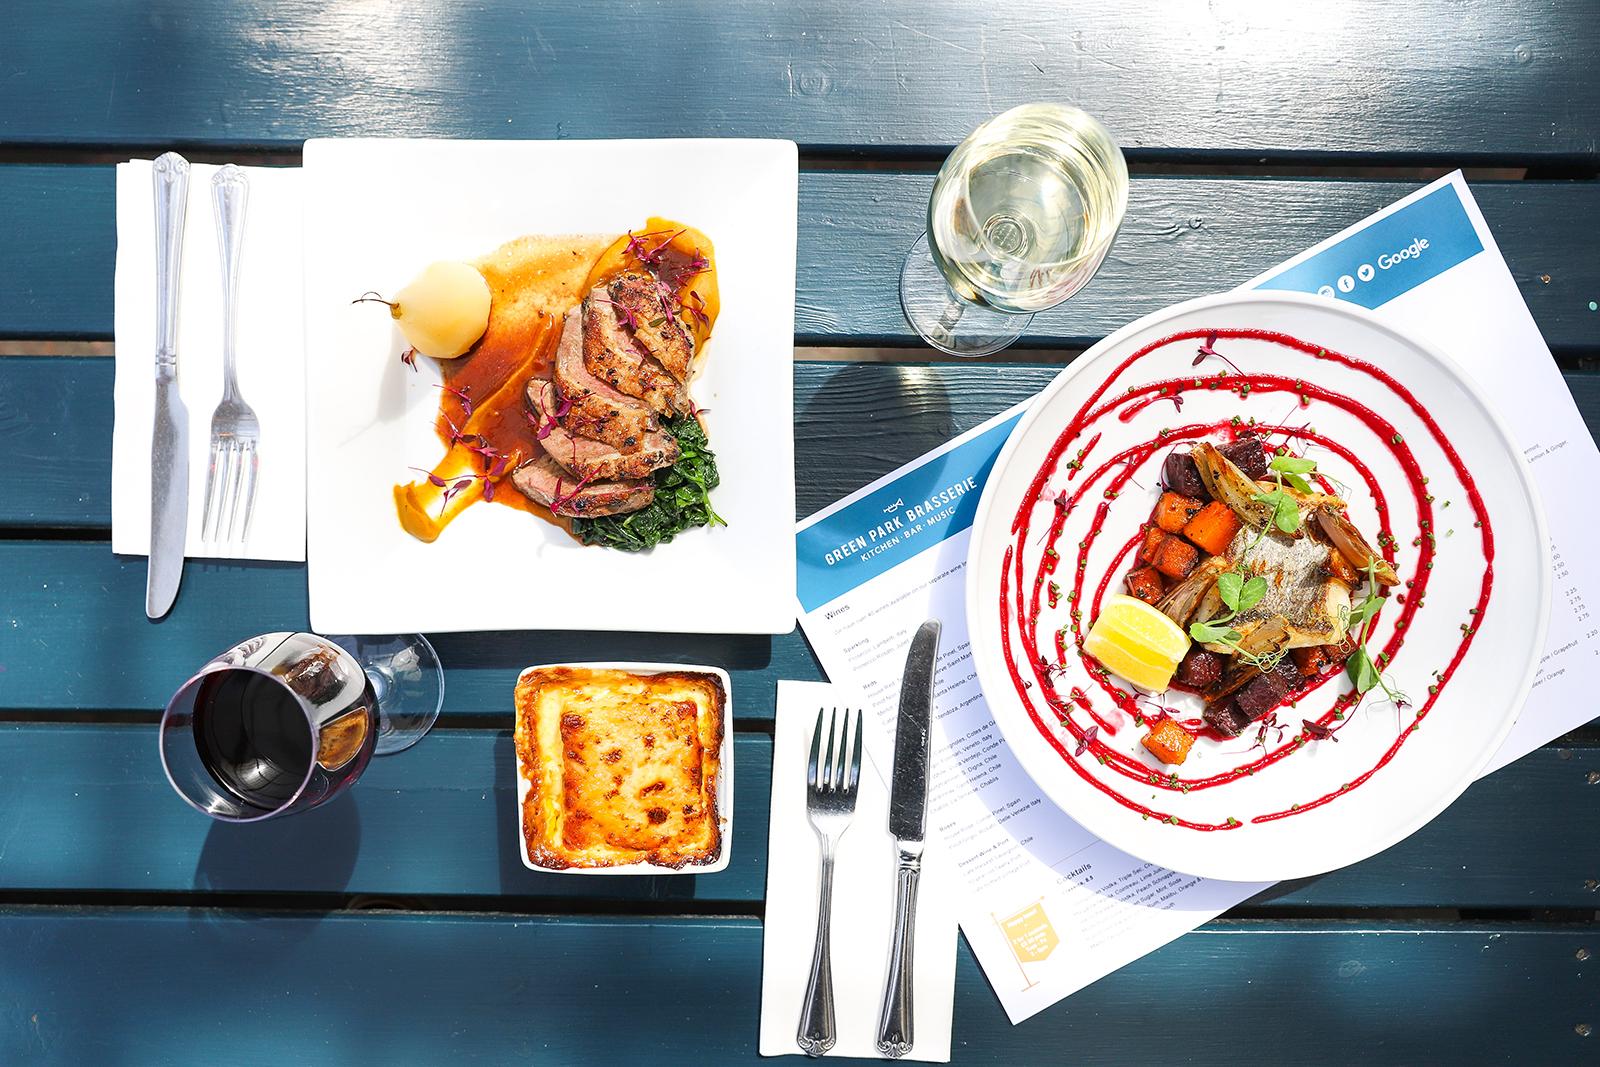 best-restaurant-in-bath-food-1600.jpg